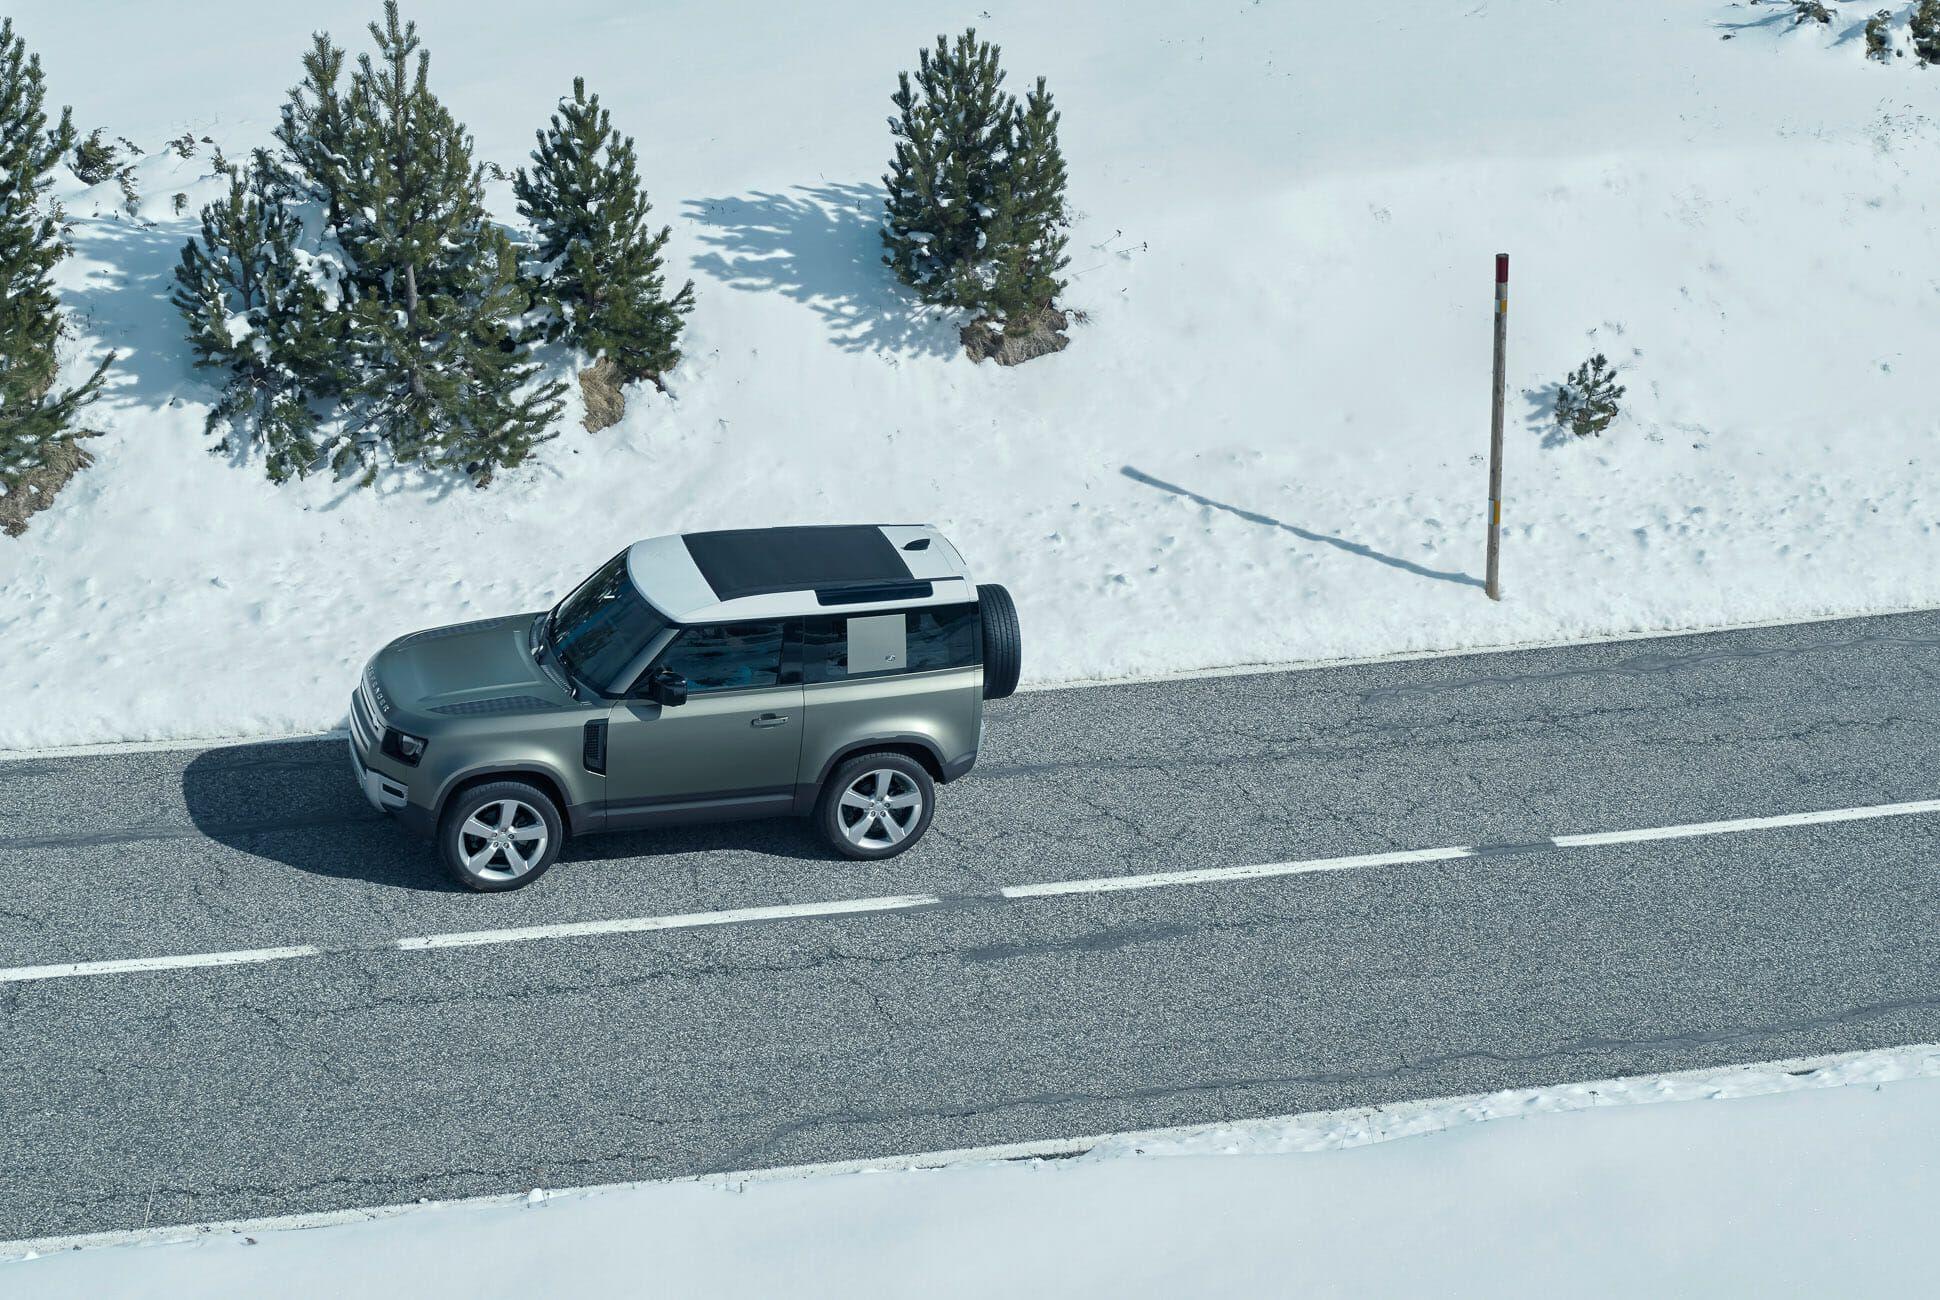 Land Rover Defender Gear Patrol-Exterior Action-Slide-07